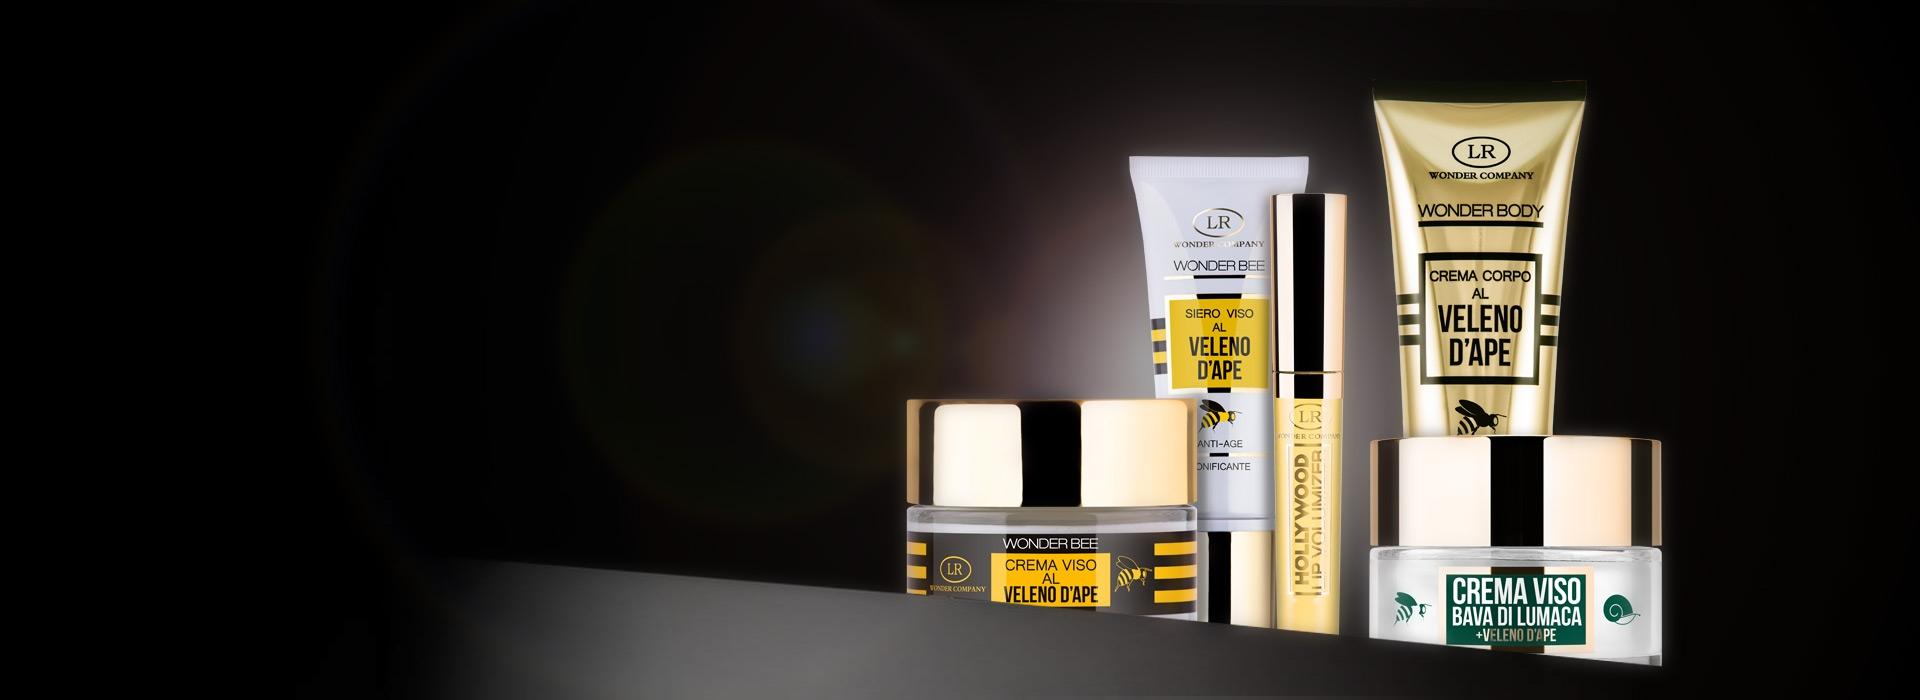 Creme viso e corpo al veleno d'ape LR Wonder Company, Wonder Body, Wonder Bee, Lip Volumizer